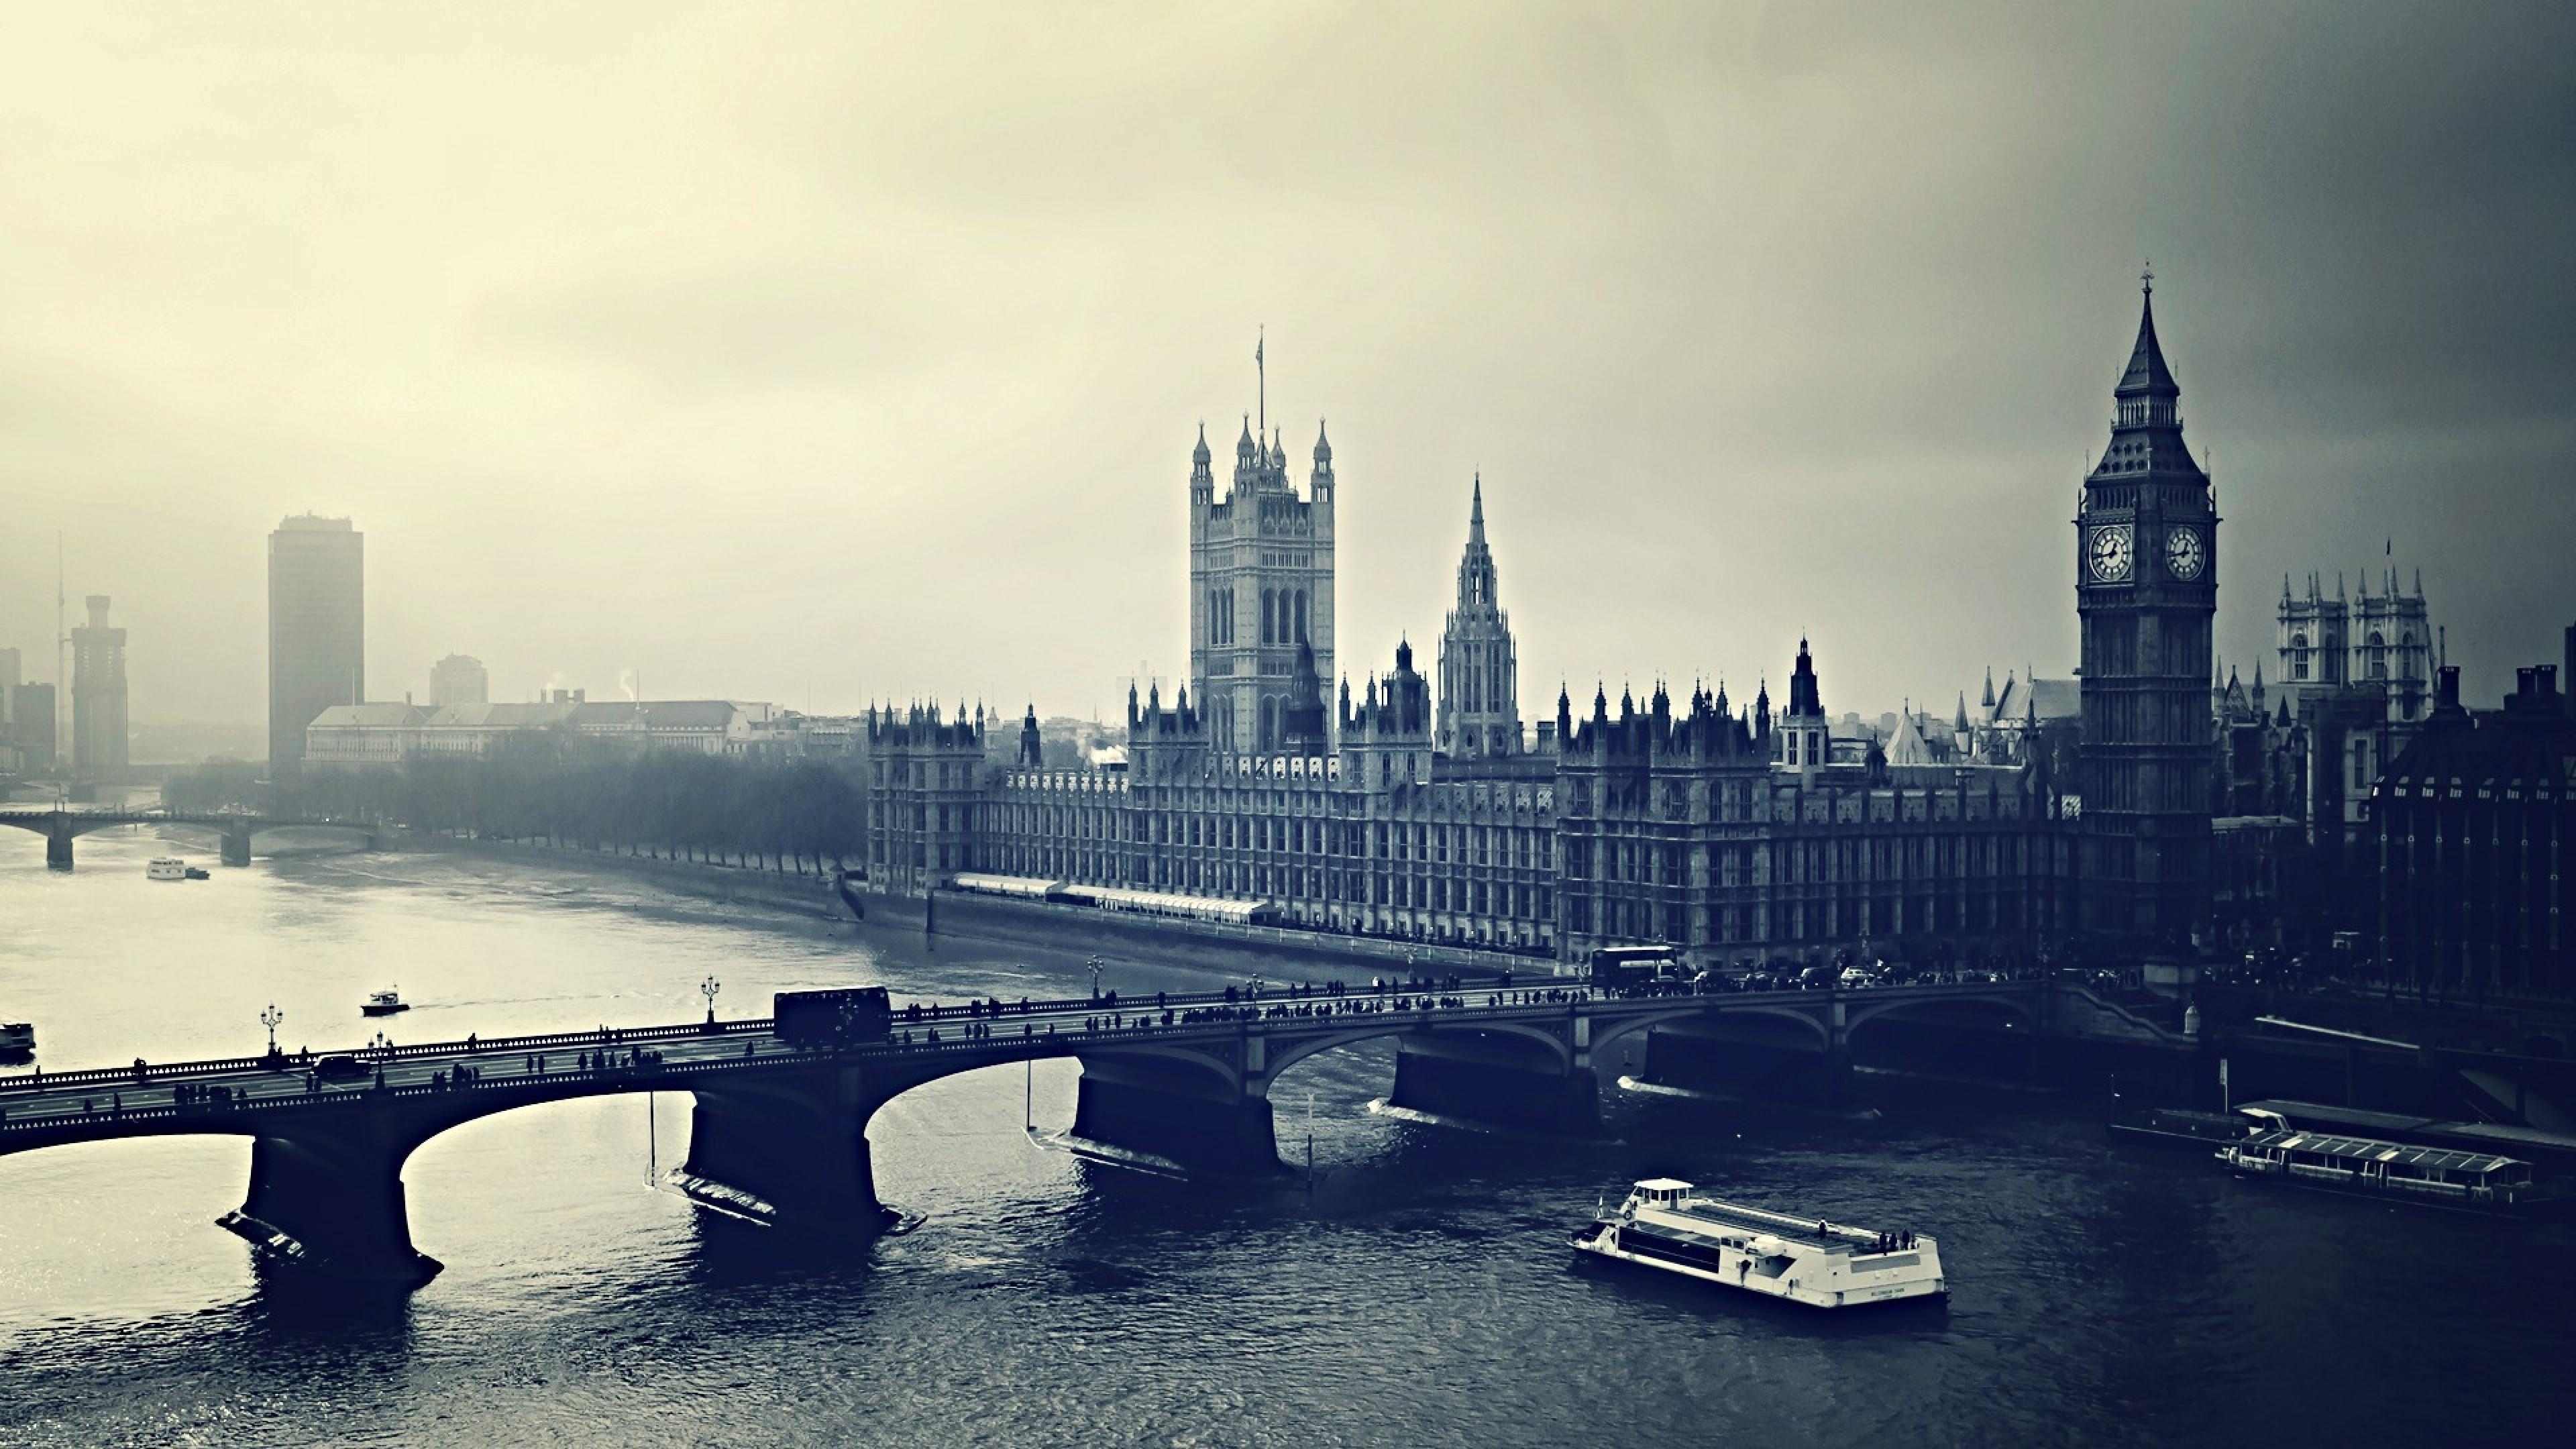 Houses of Parliament and Big Ben wallpaper